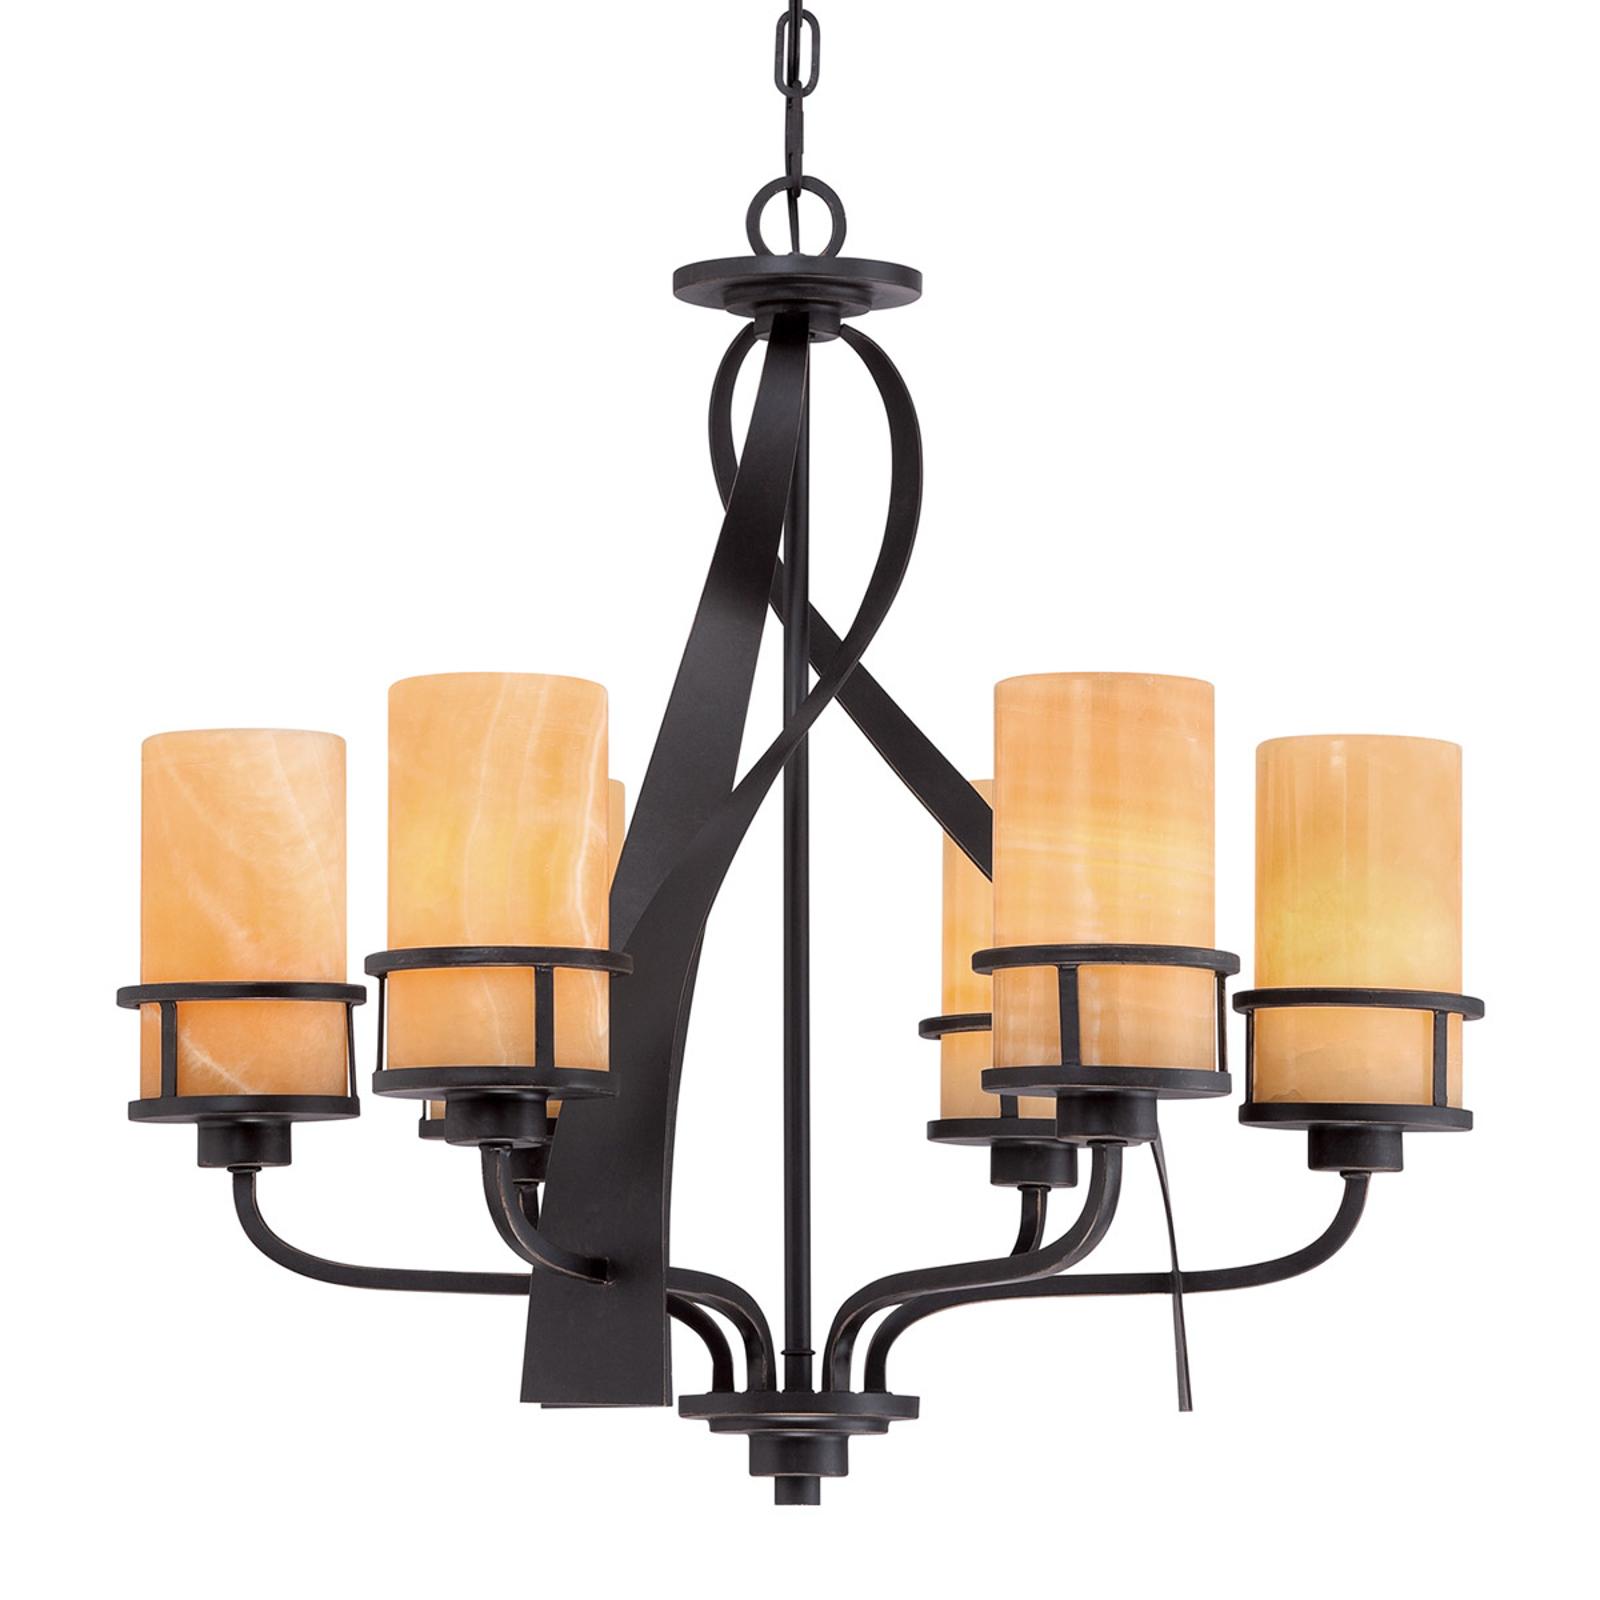 6-light chandelier Kyle_3048337_1